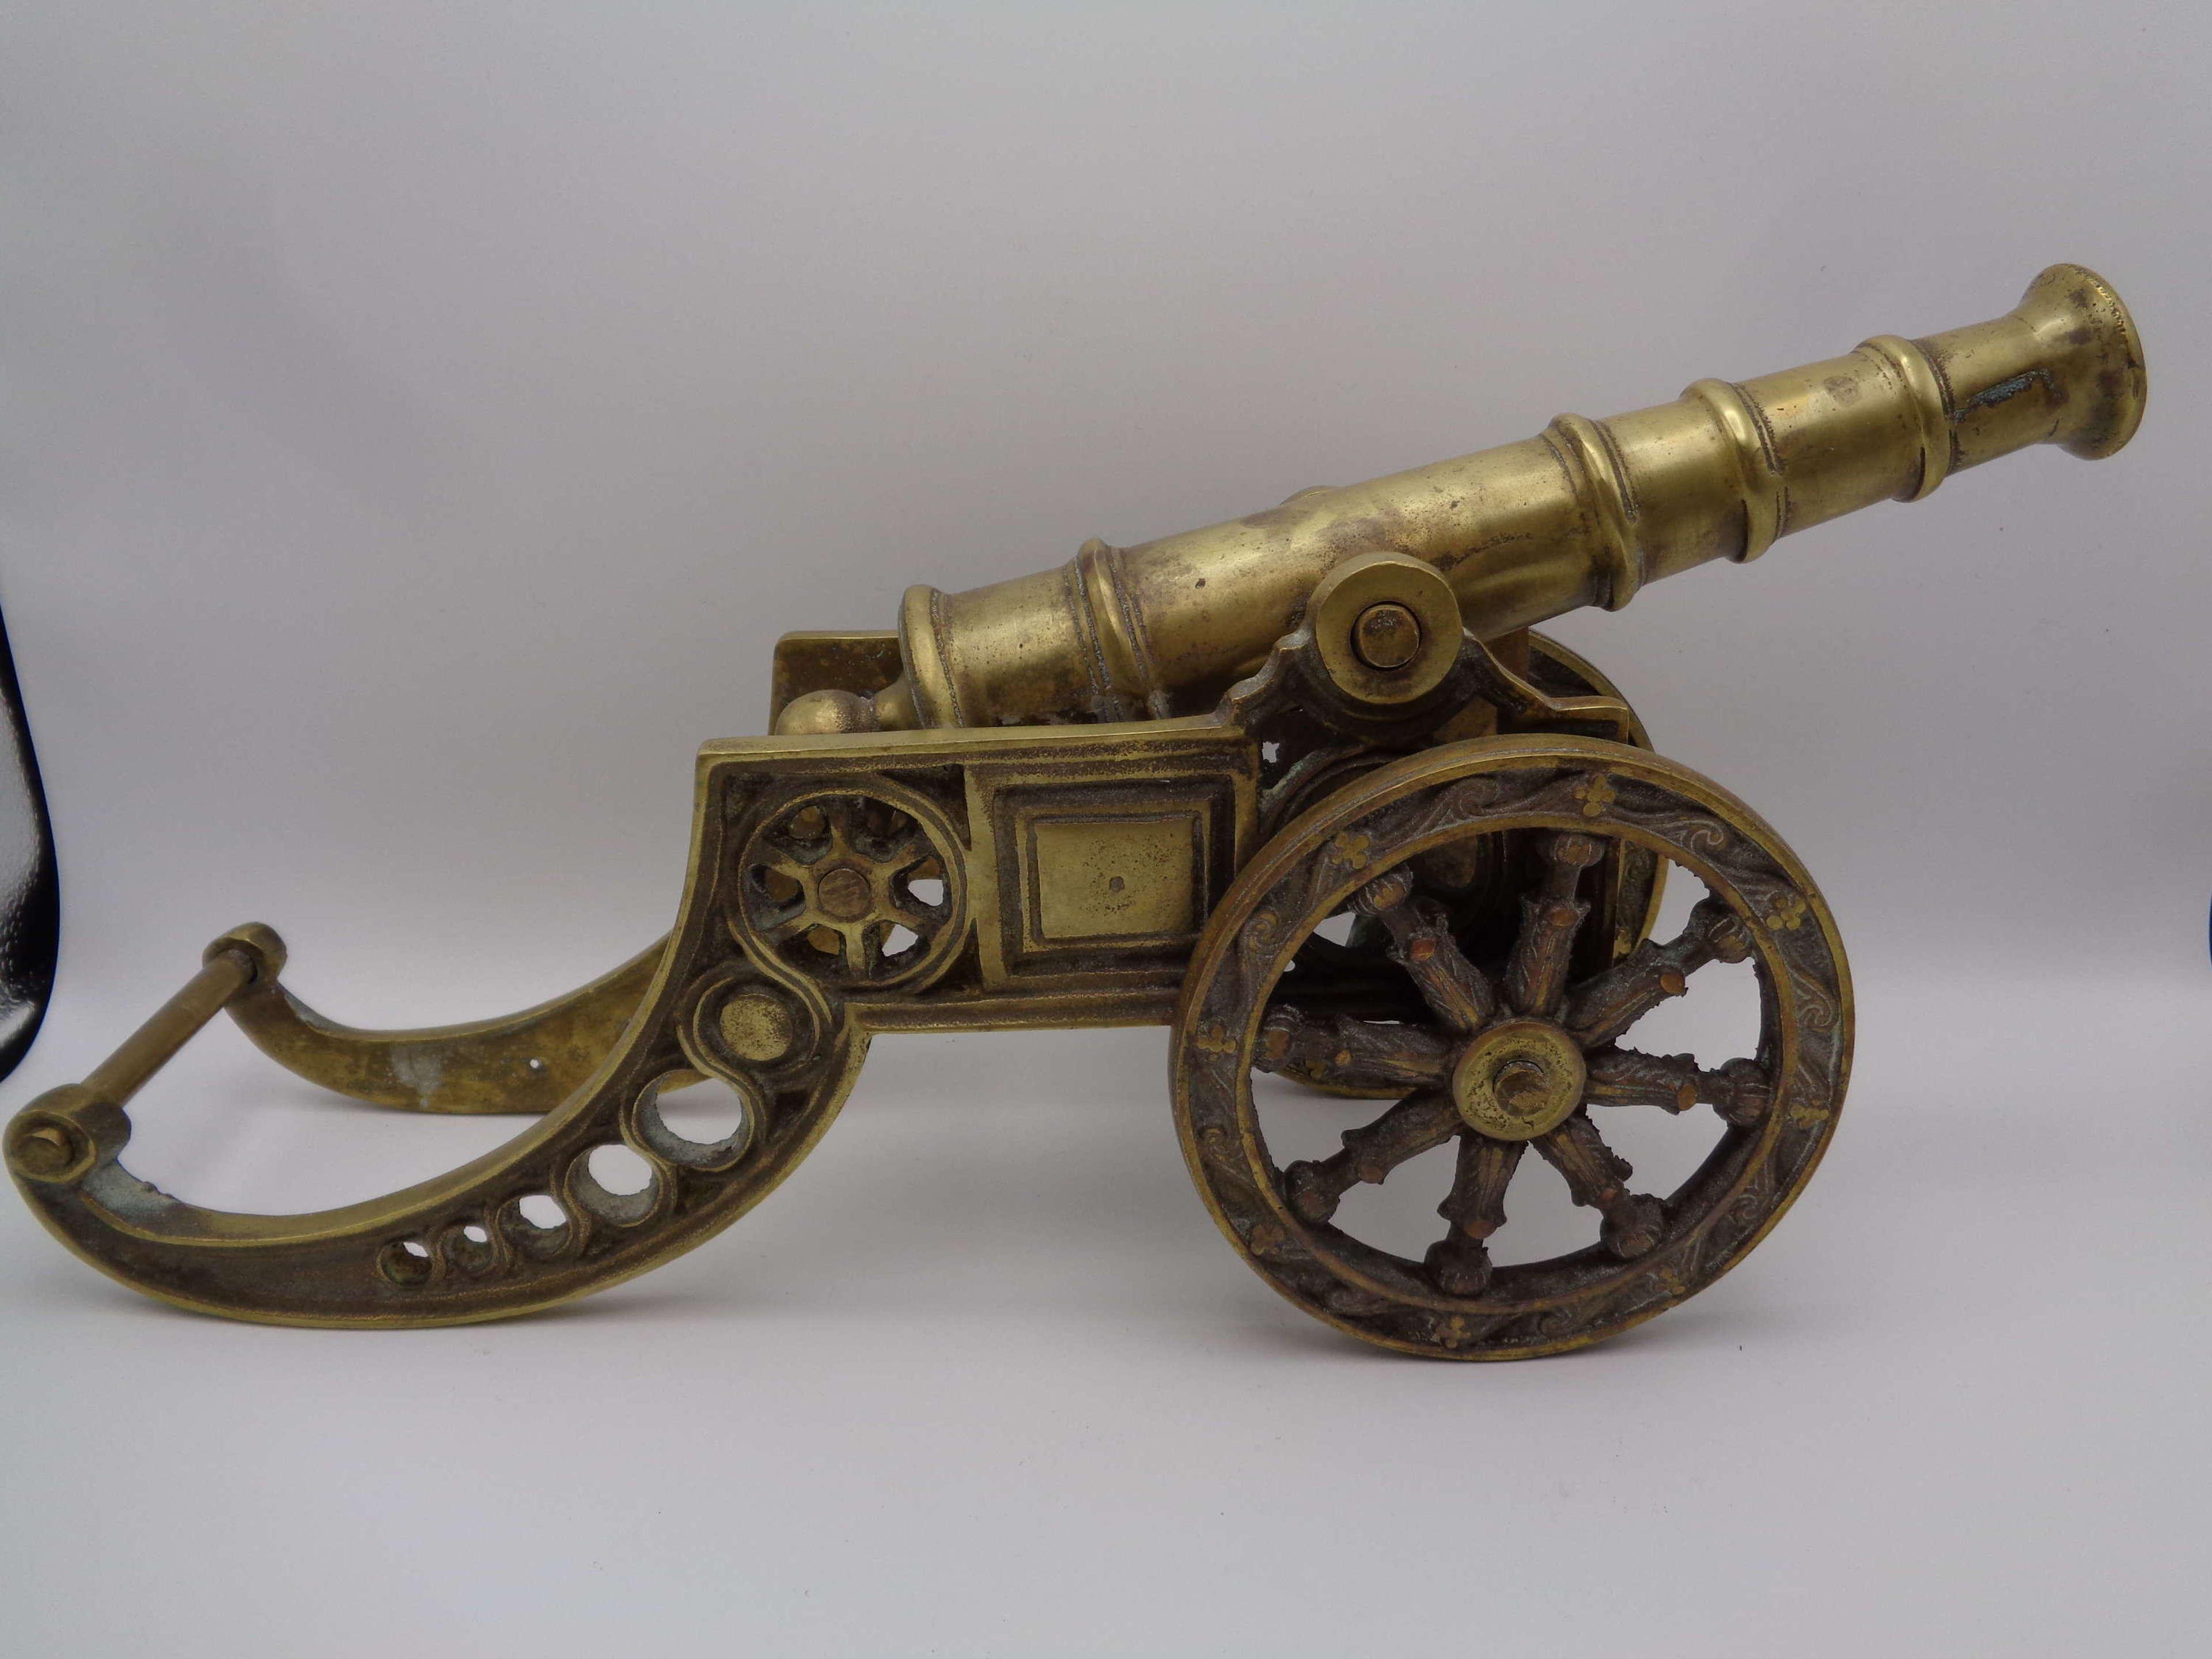 Vintage Brass Cannon - Desk Ornament